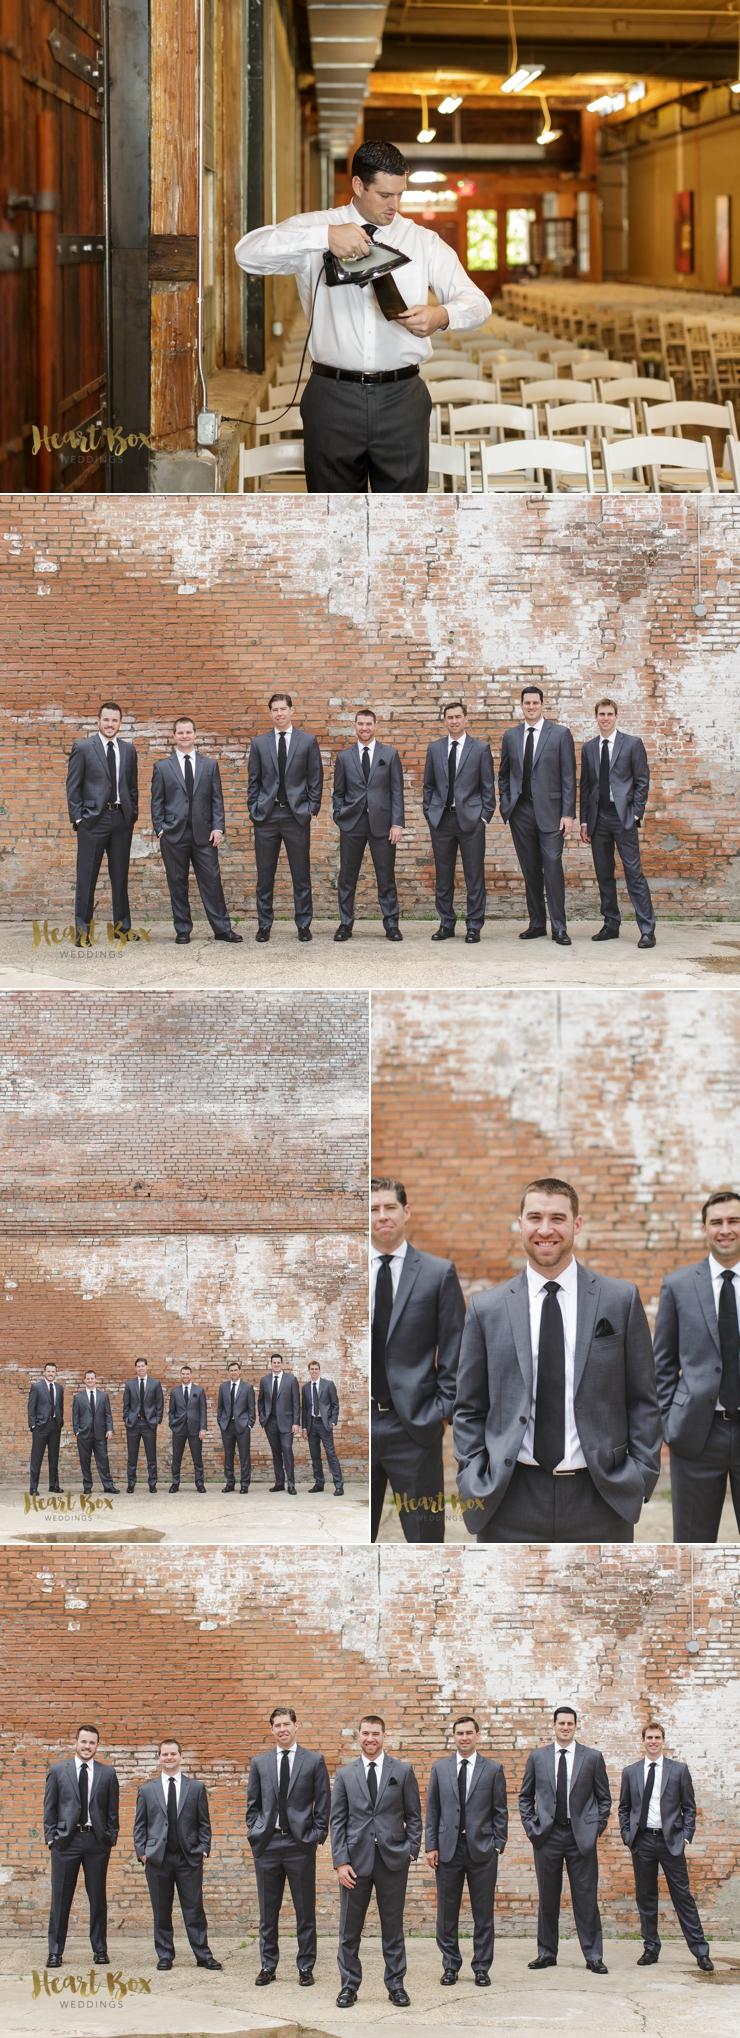 Popplewell Wedding Blog Collages 4.jpg